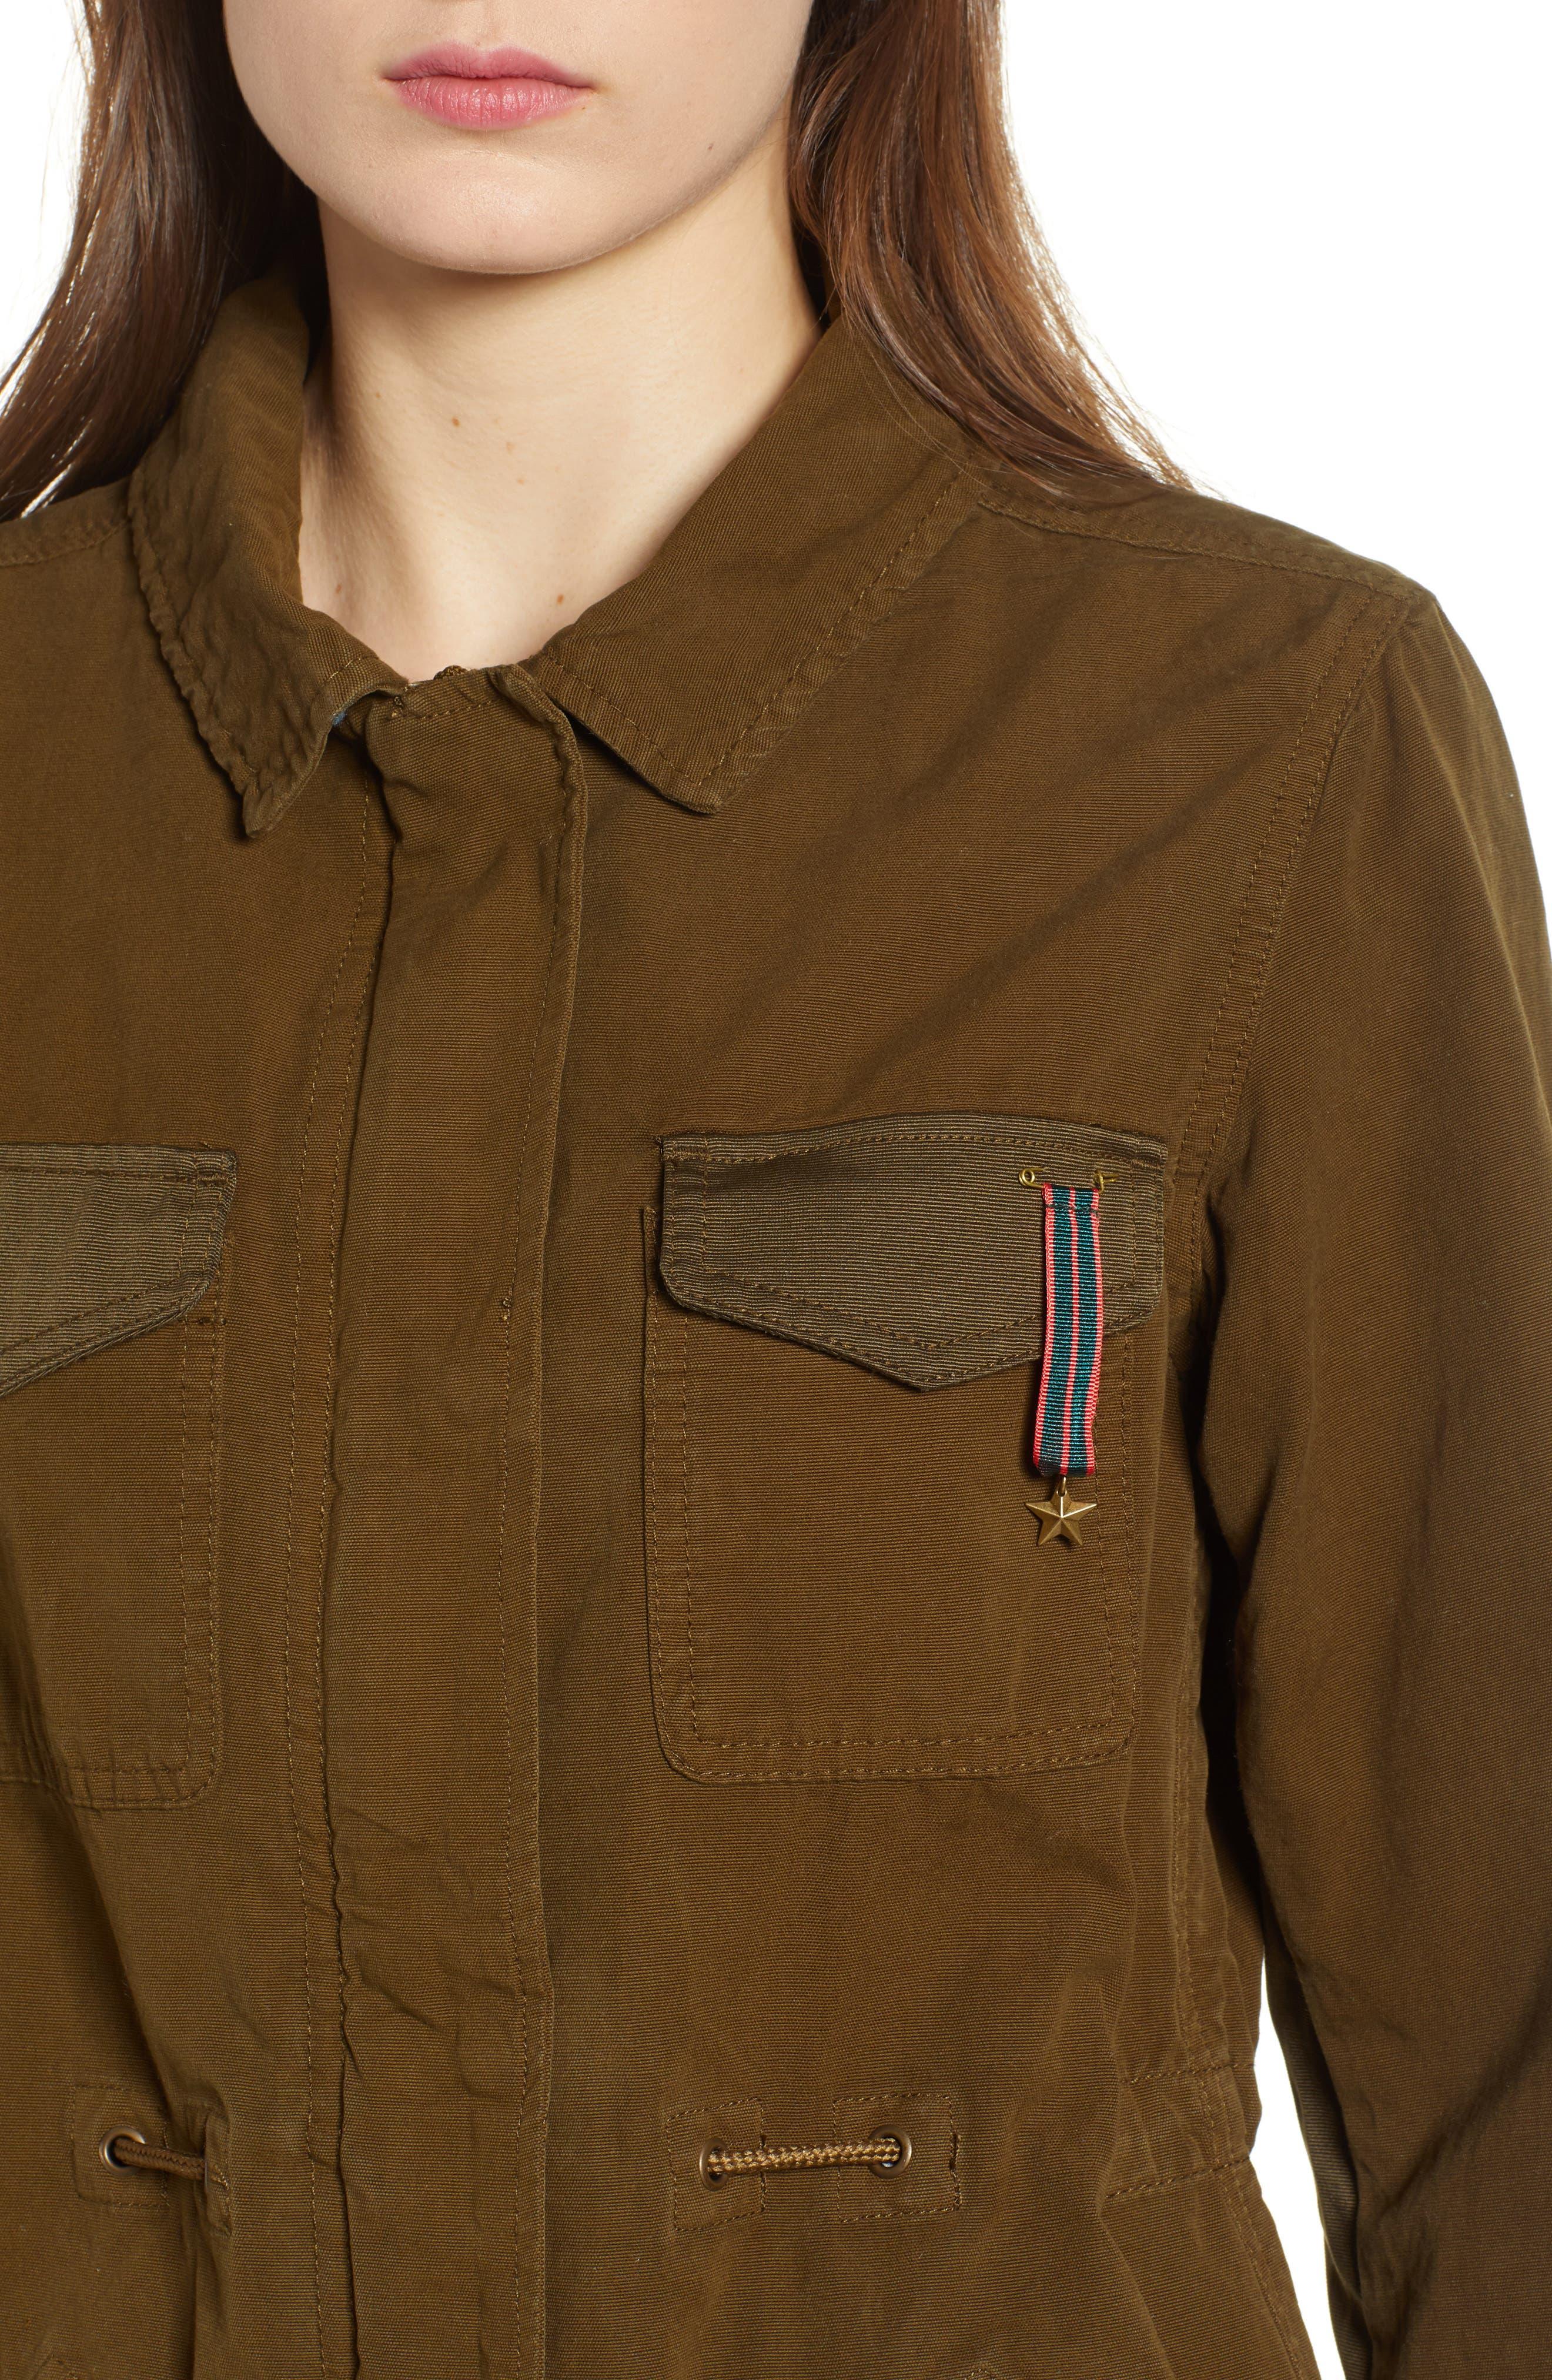 Safari Jacket,                             Alternate thumbnail 4, color,                             Color 15 Army